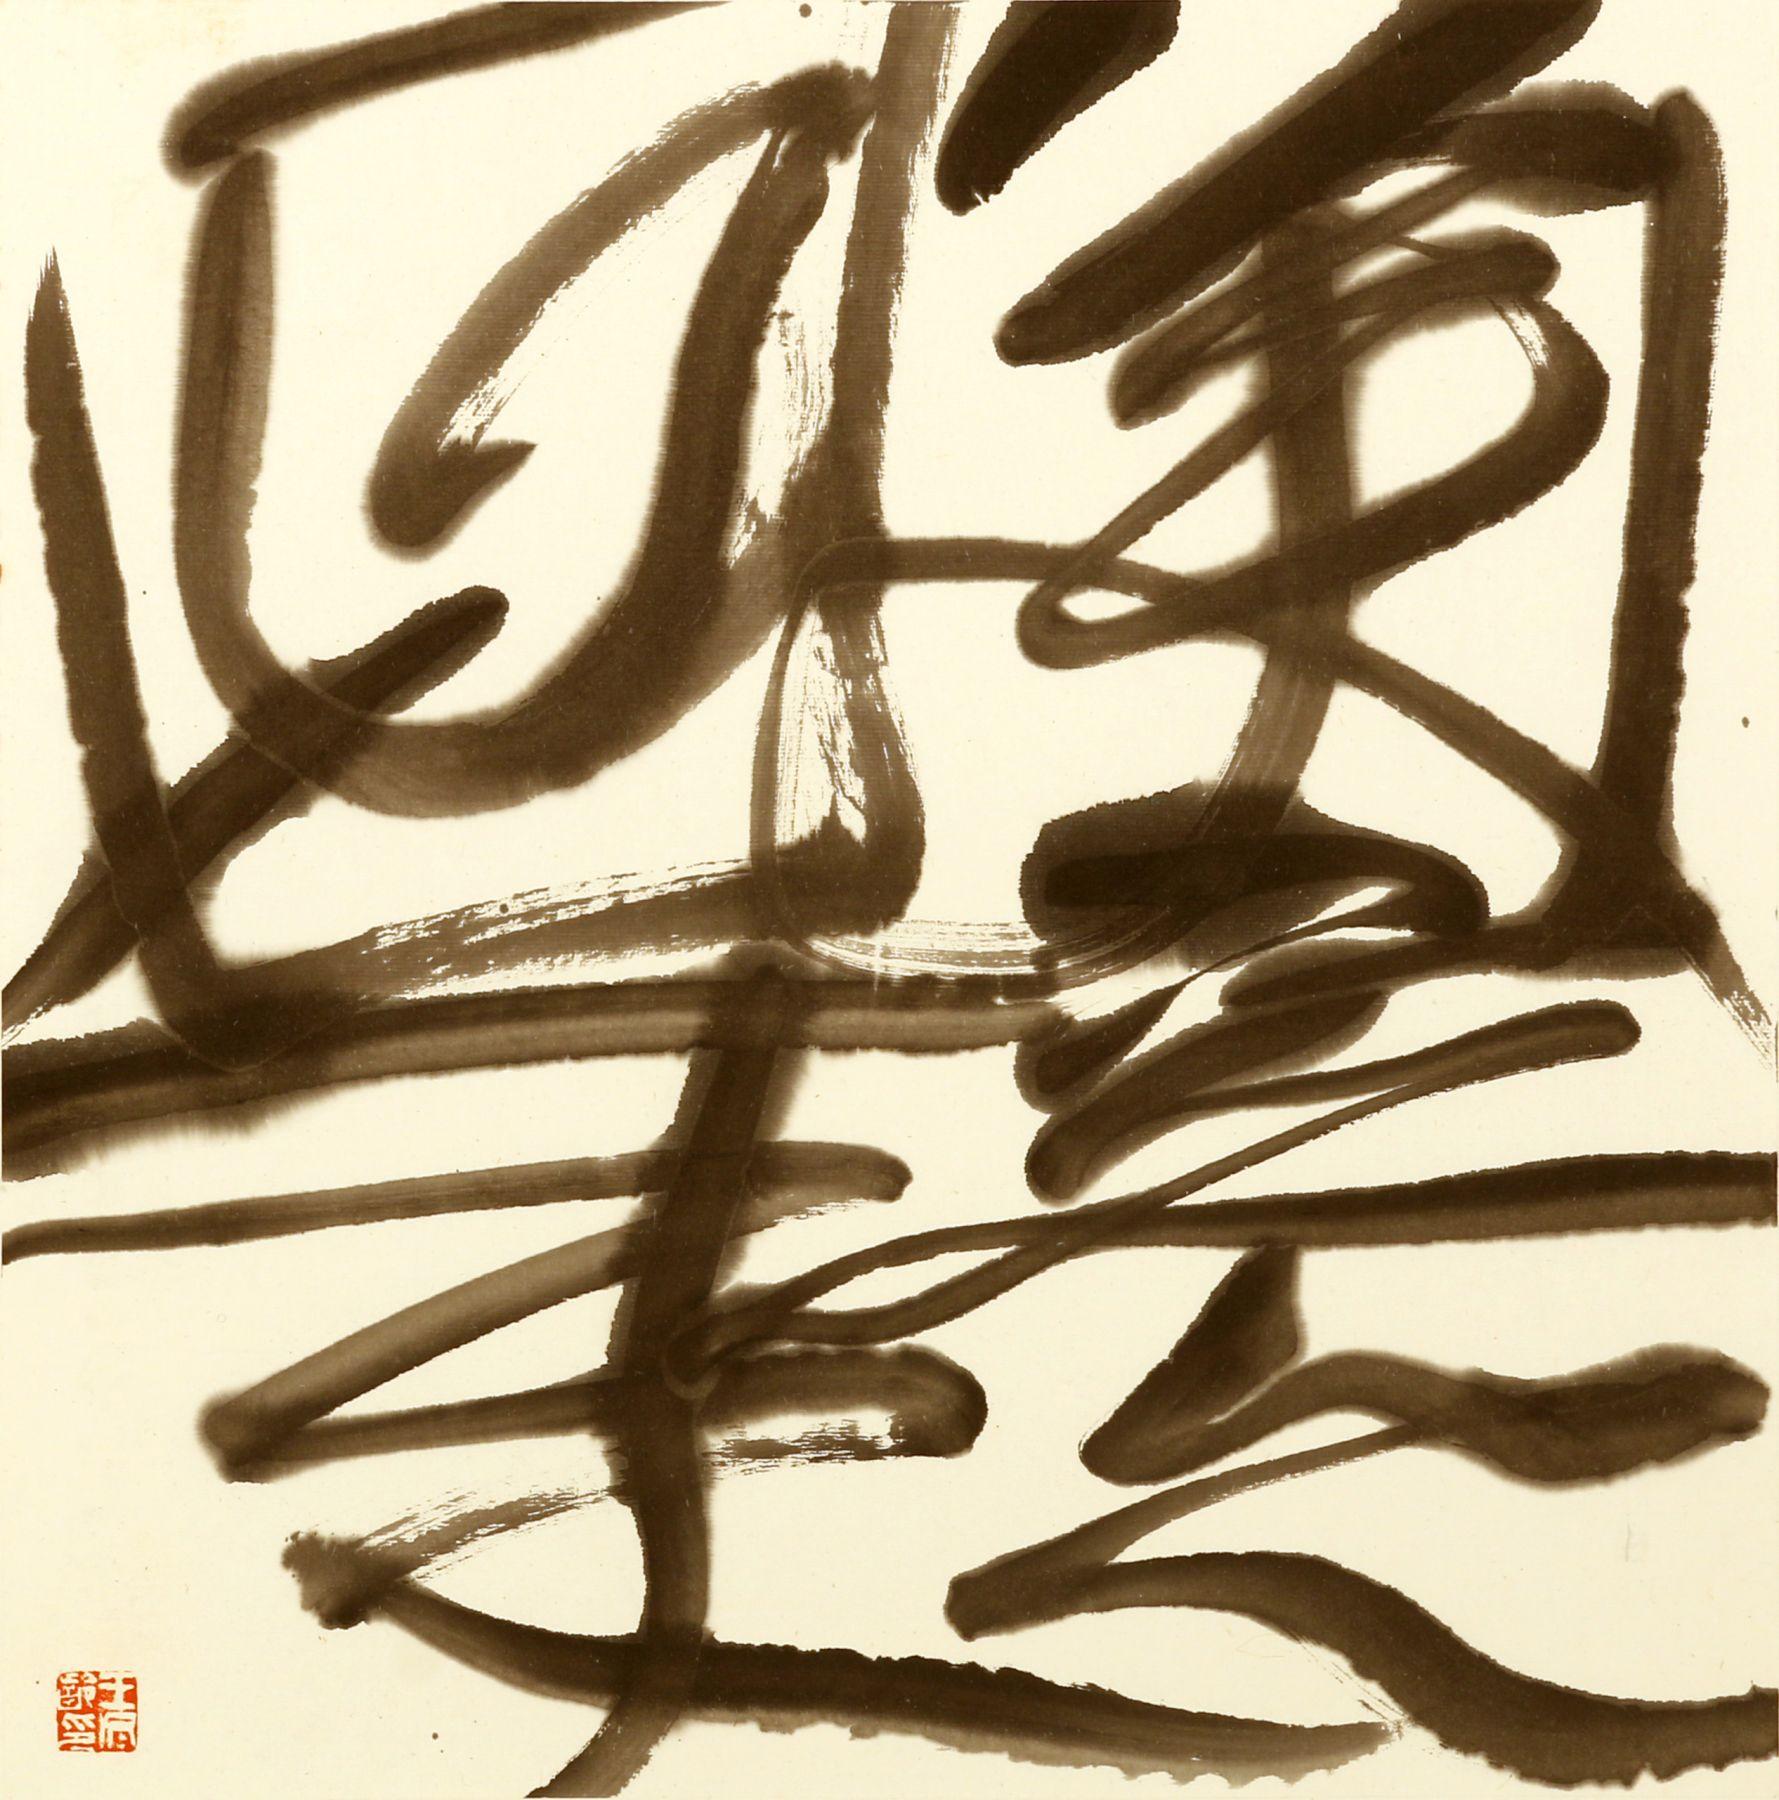 Happiness Leads to Longevity 美意延年, 2015